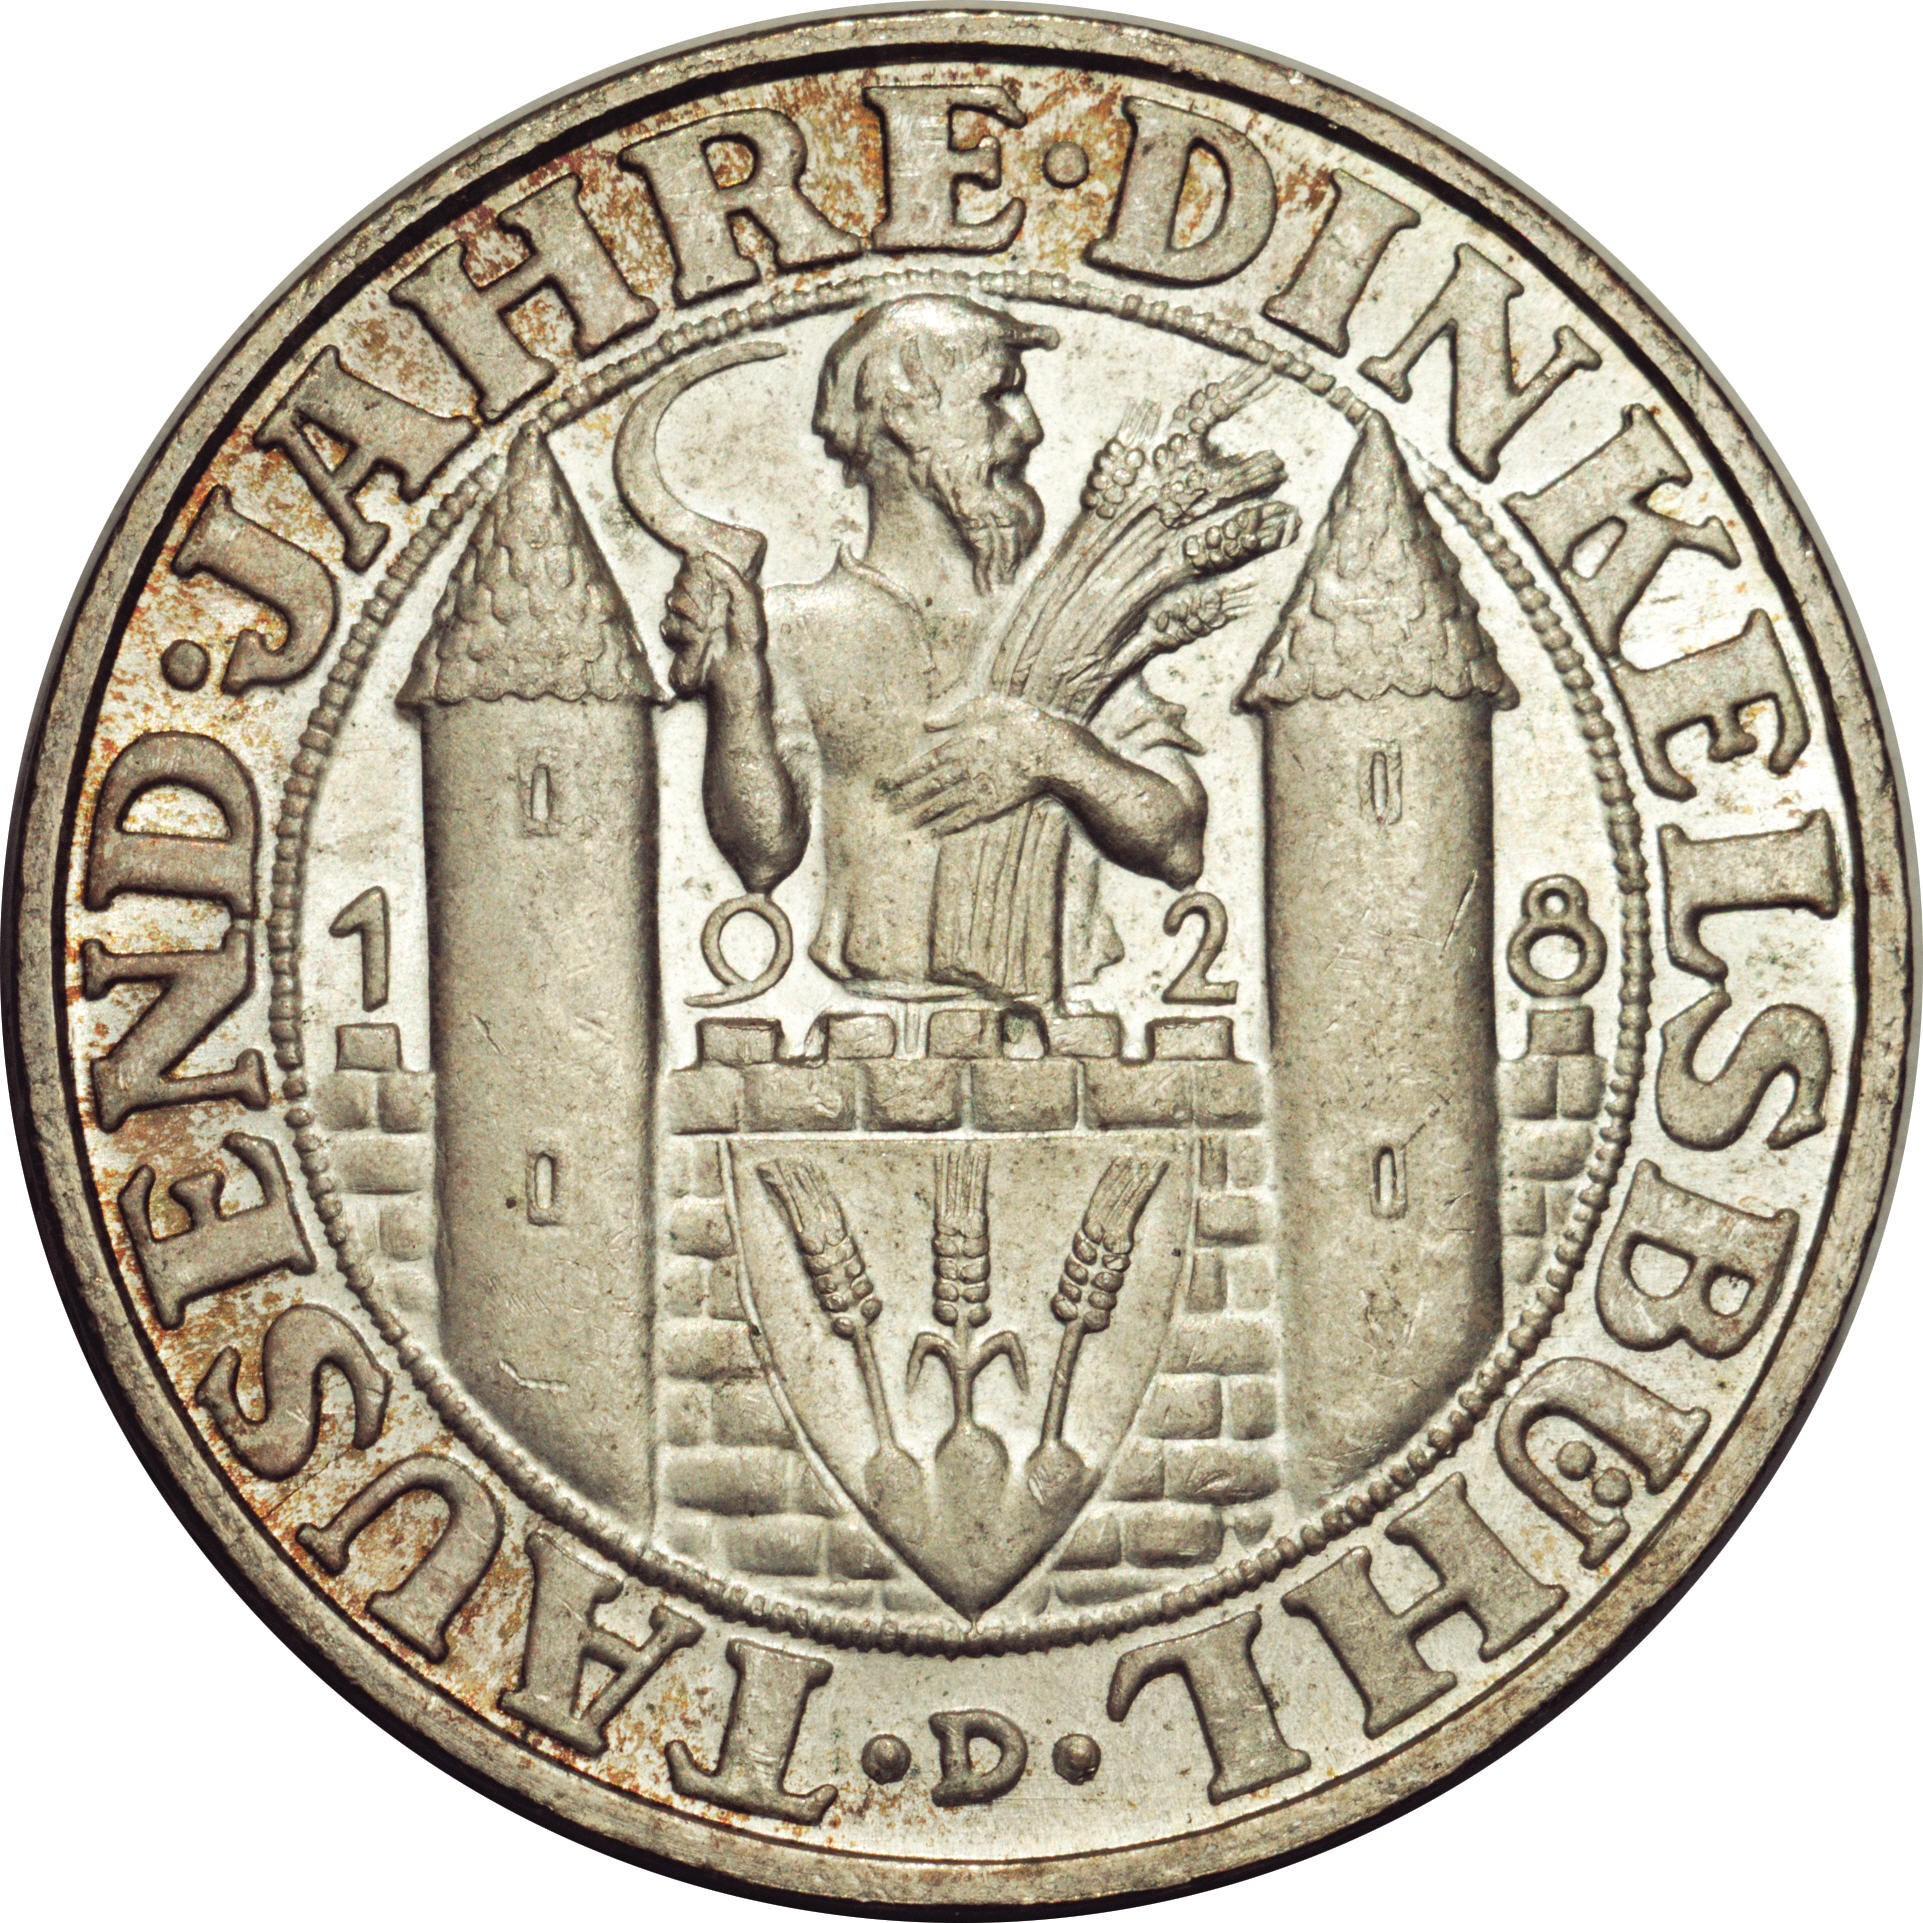 Germany 3 Reichsmark (1928 Dinkelsbühl)